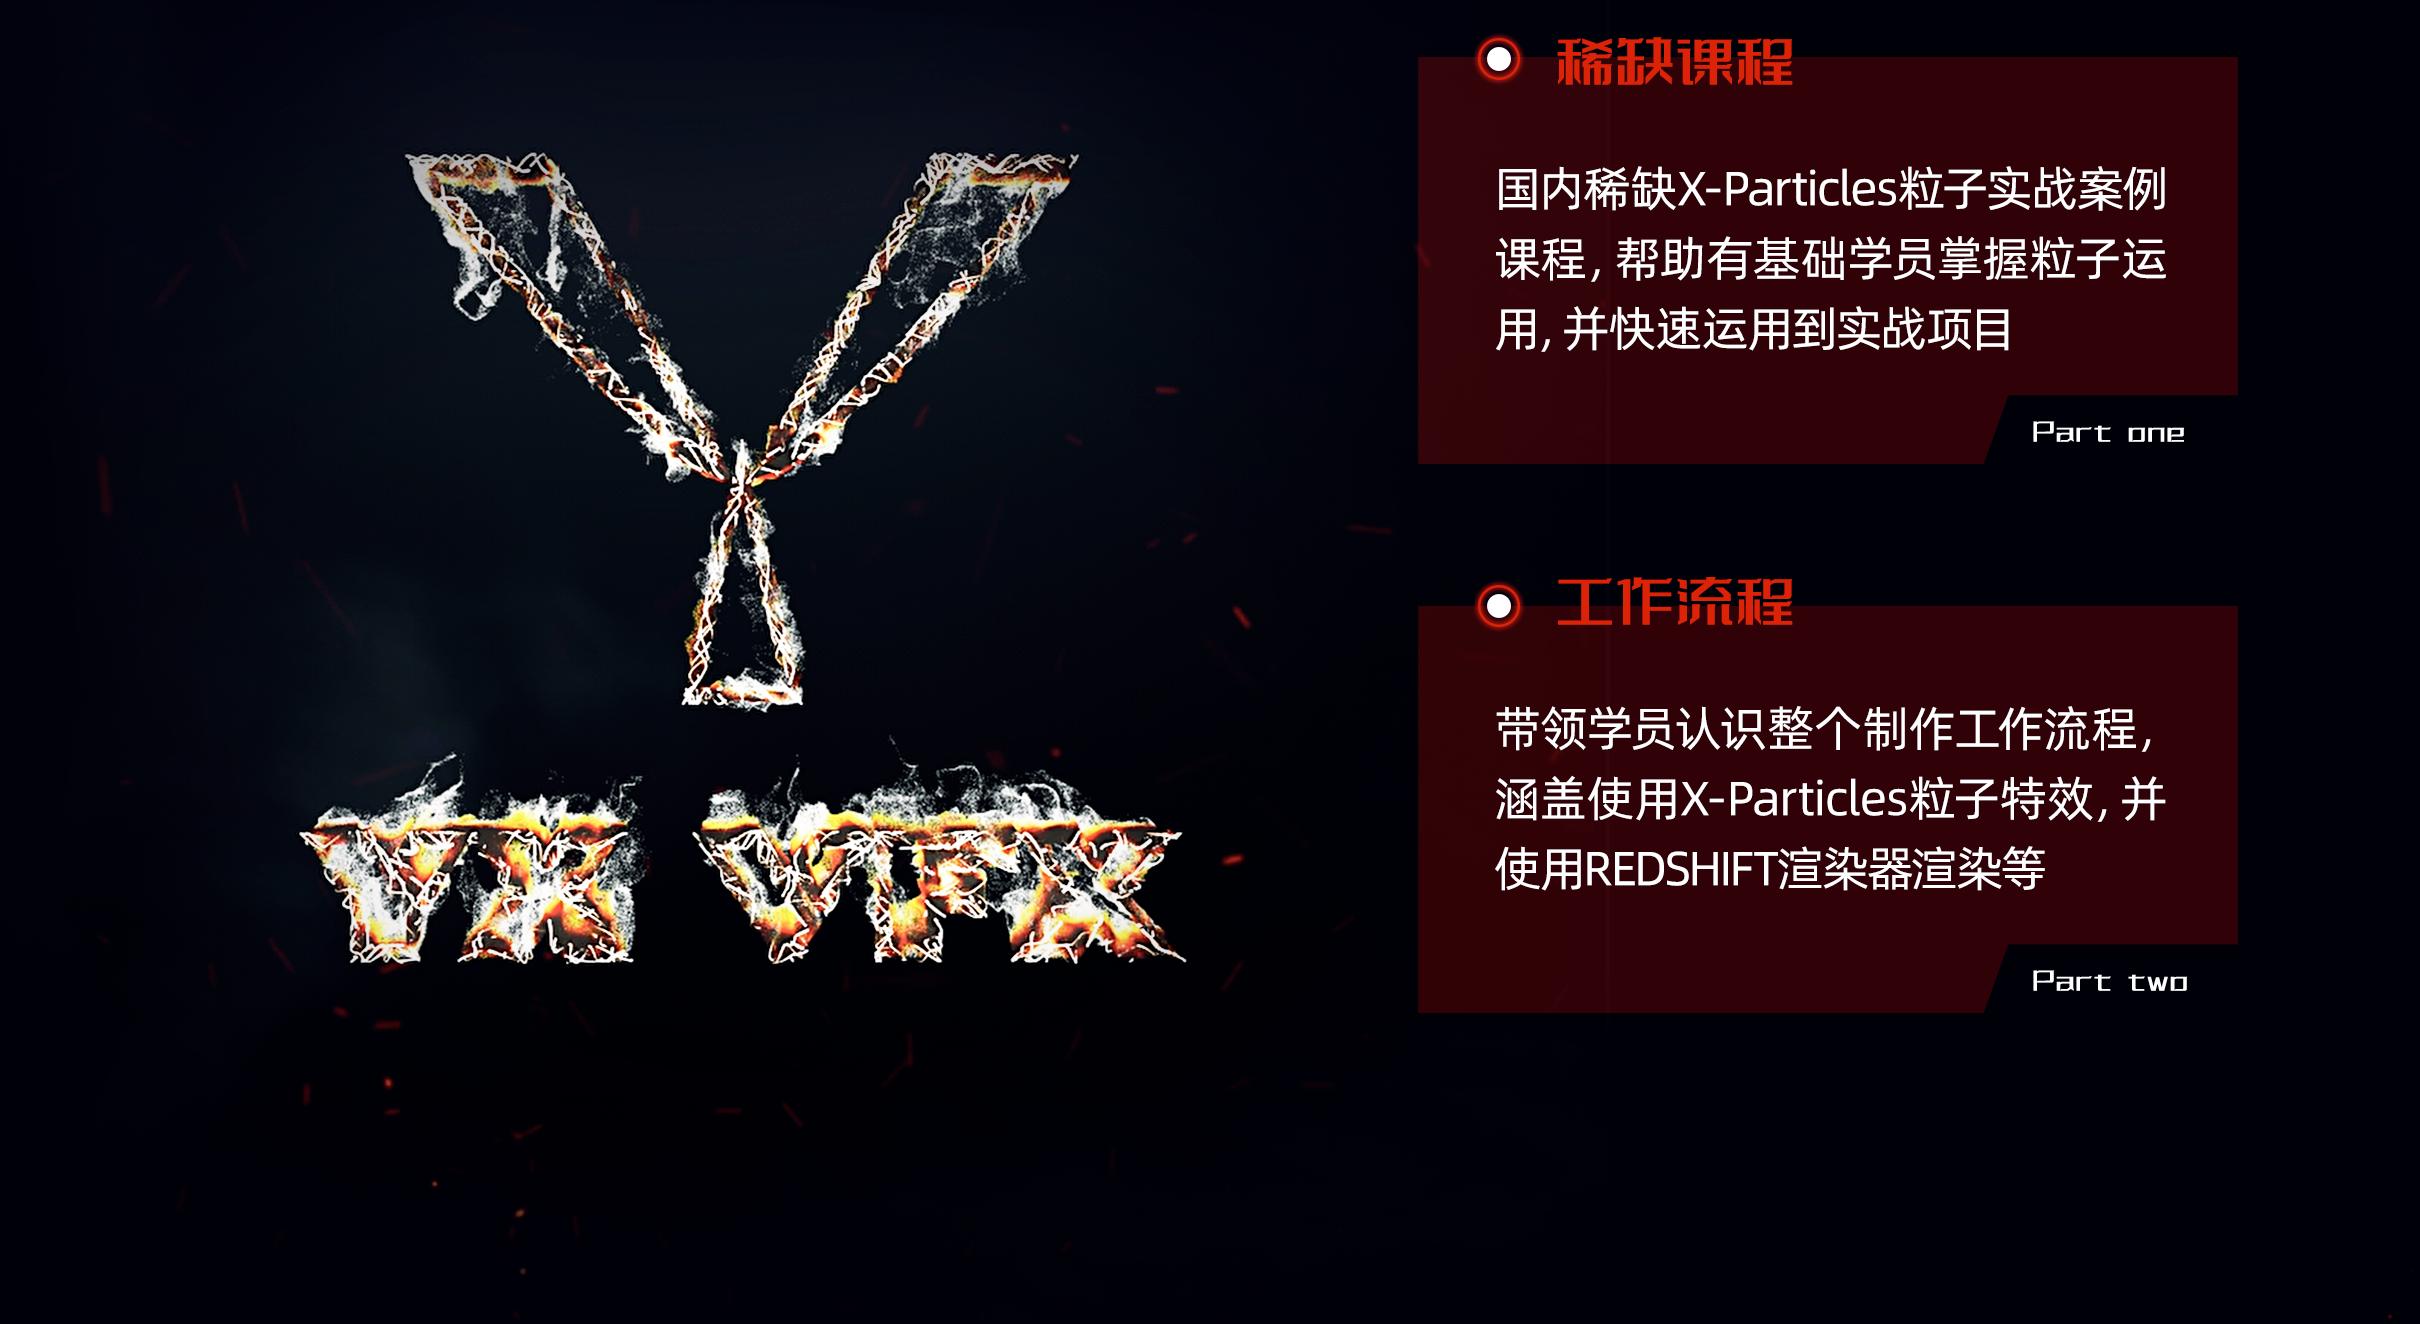 粒子_03.png